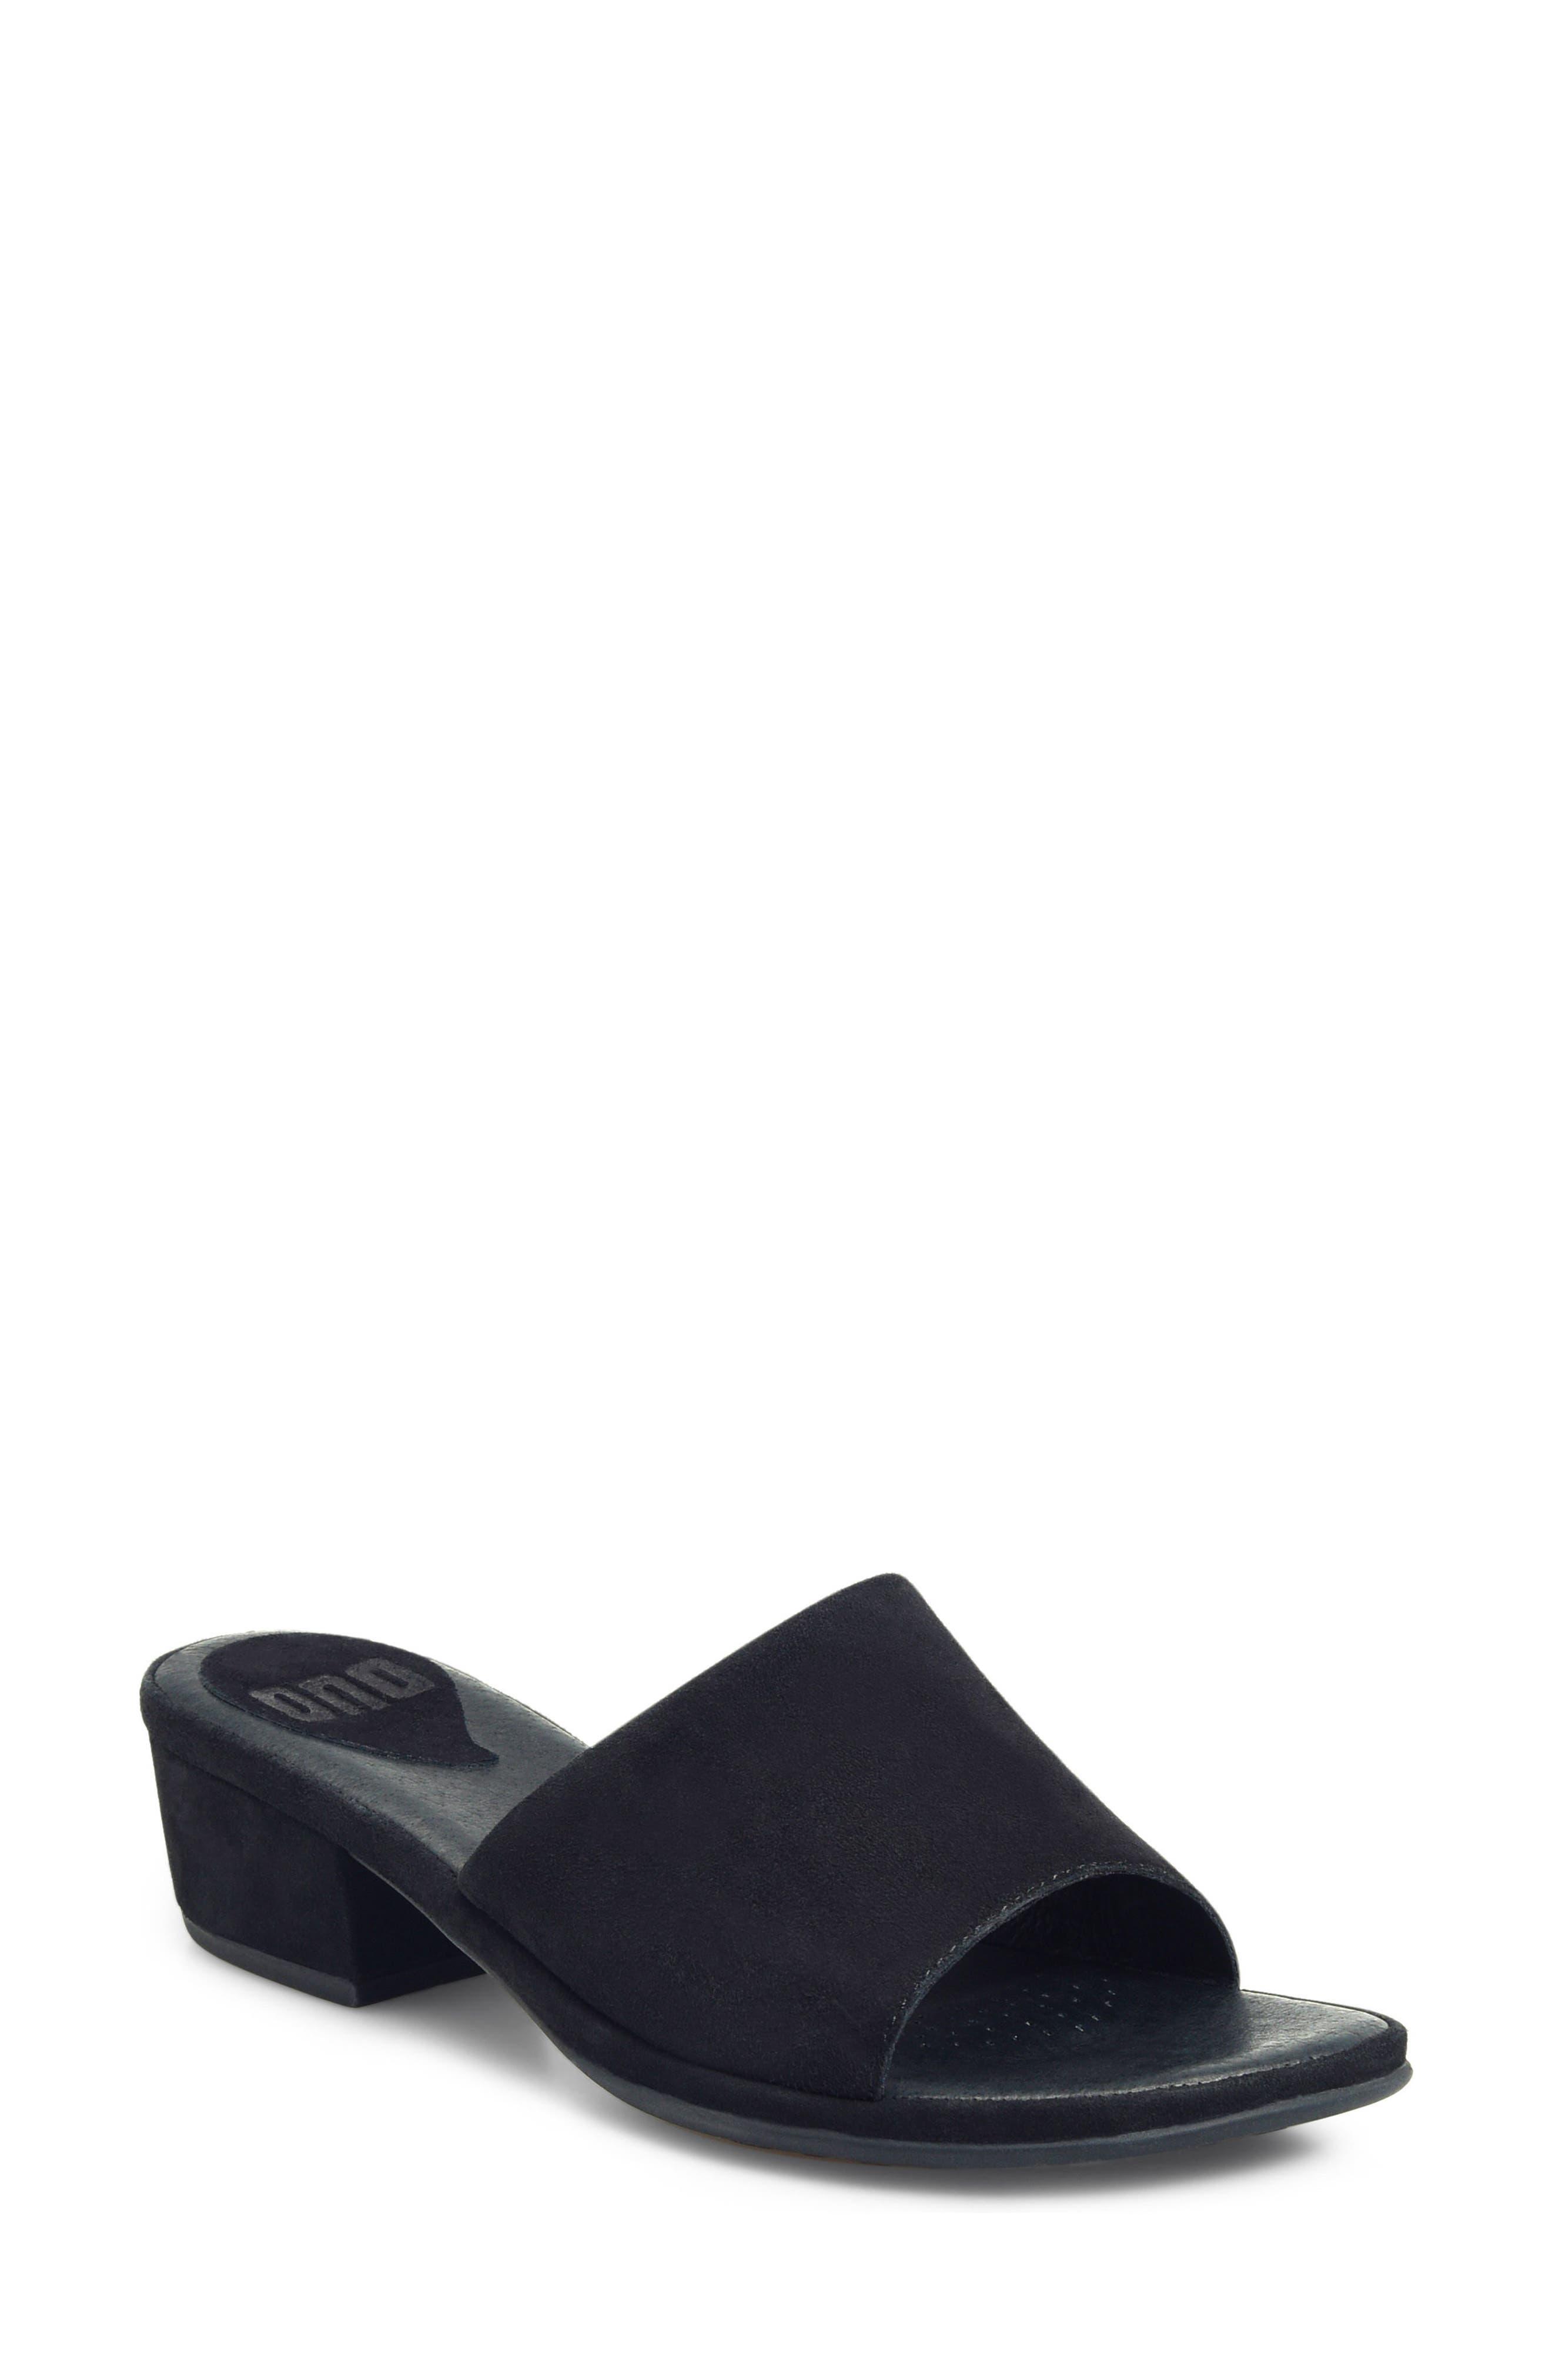 Main Image - ONO Bo Block Heel Slide Sandal (Women)